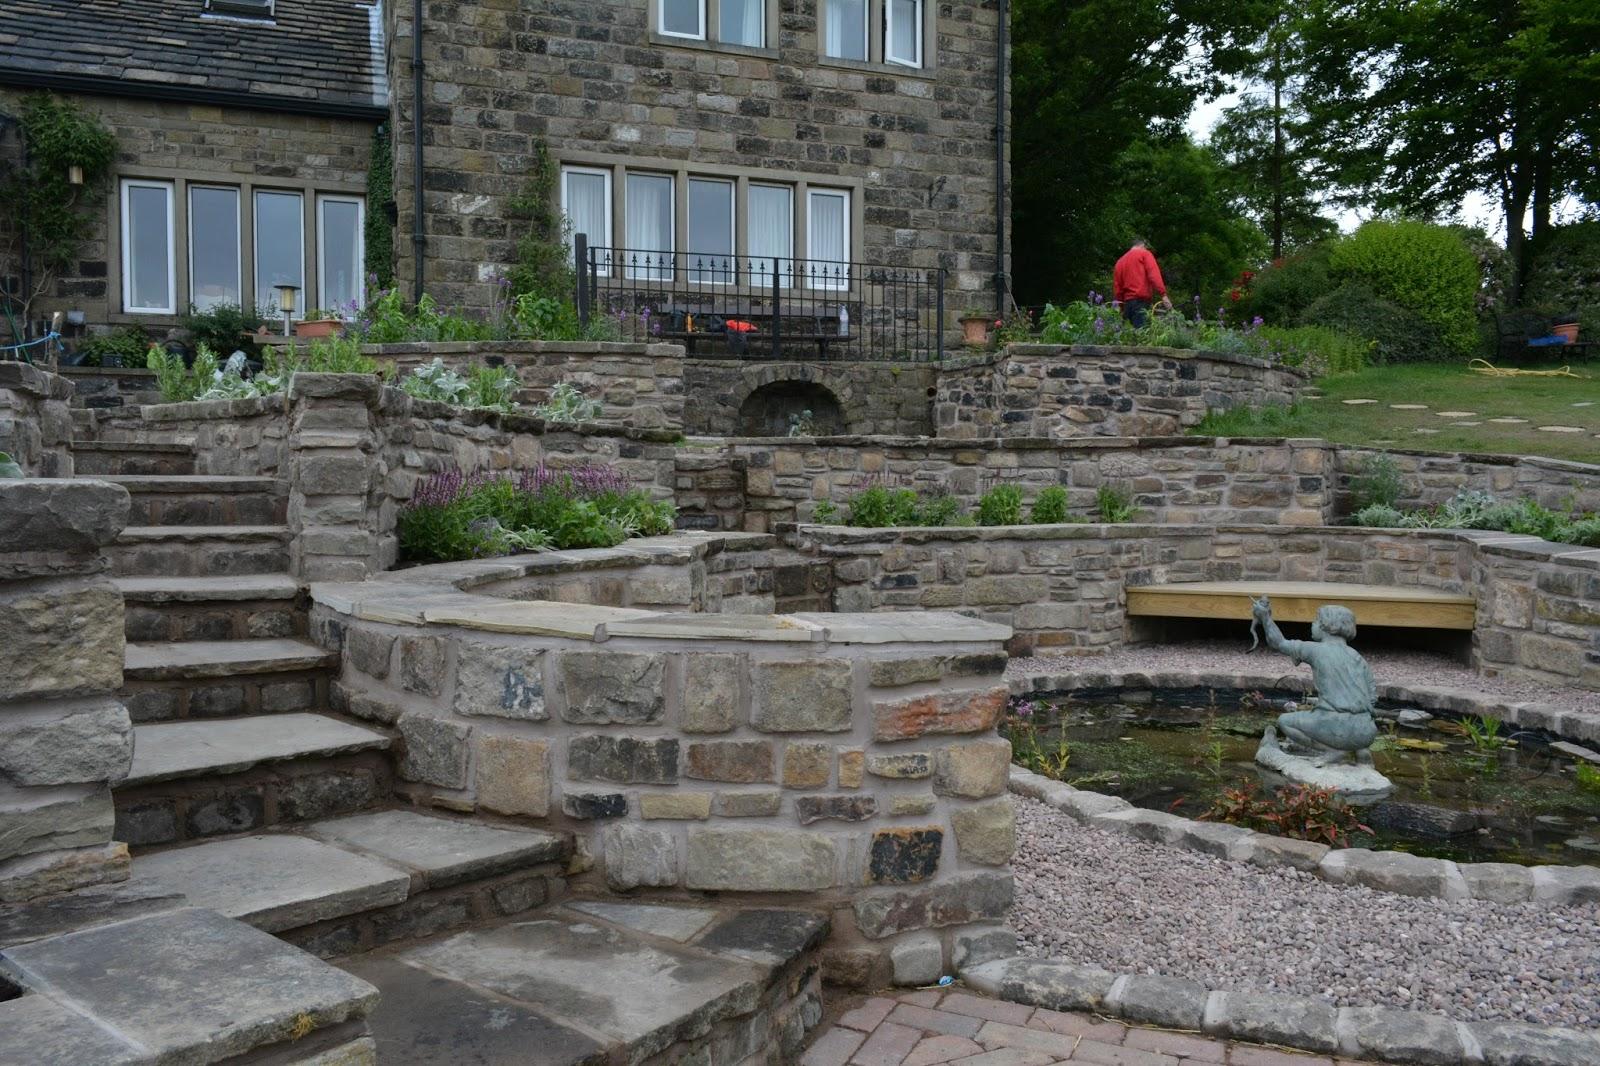 Garden Design York david keegans garden design blog: garden design in saddleworth,